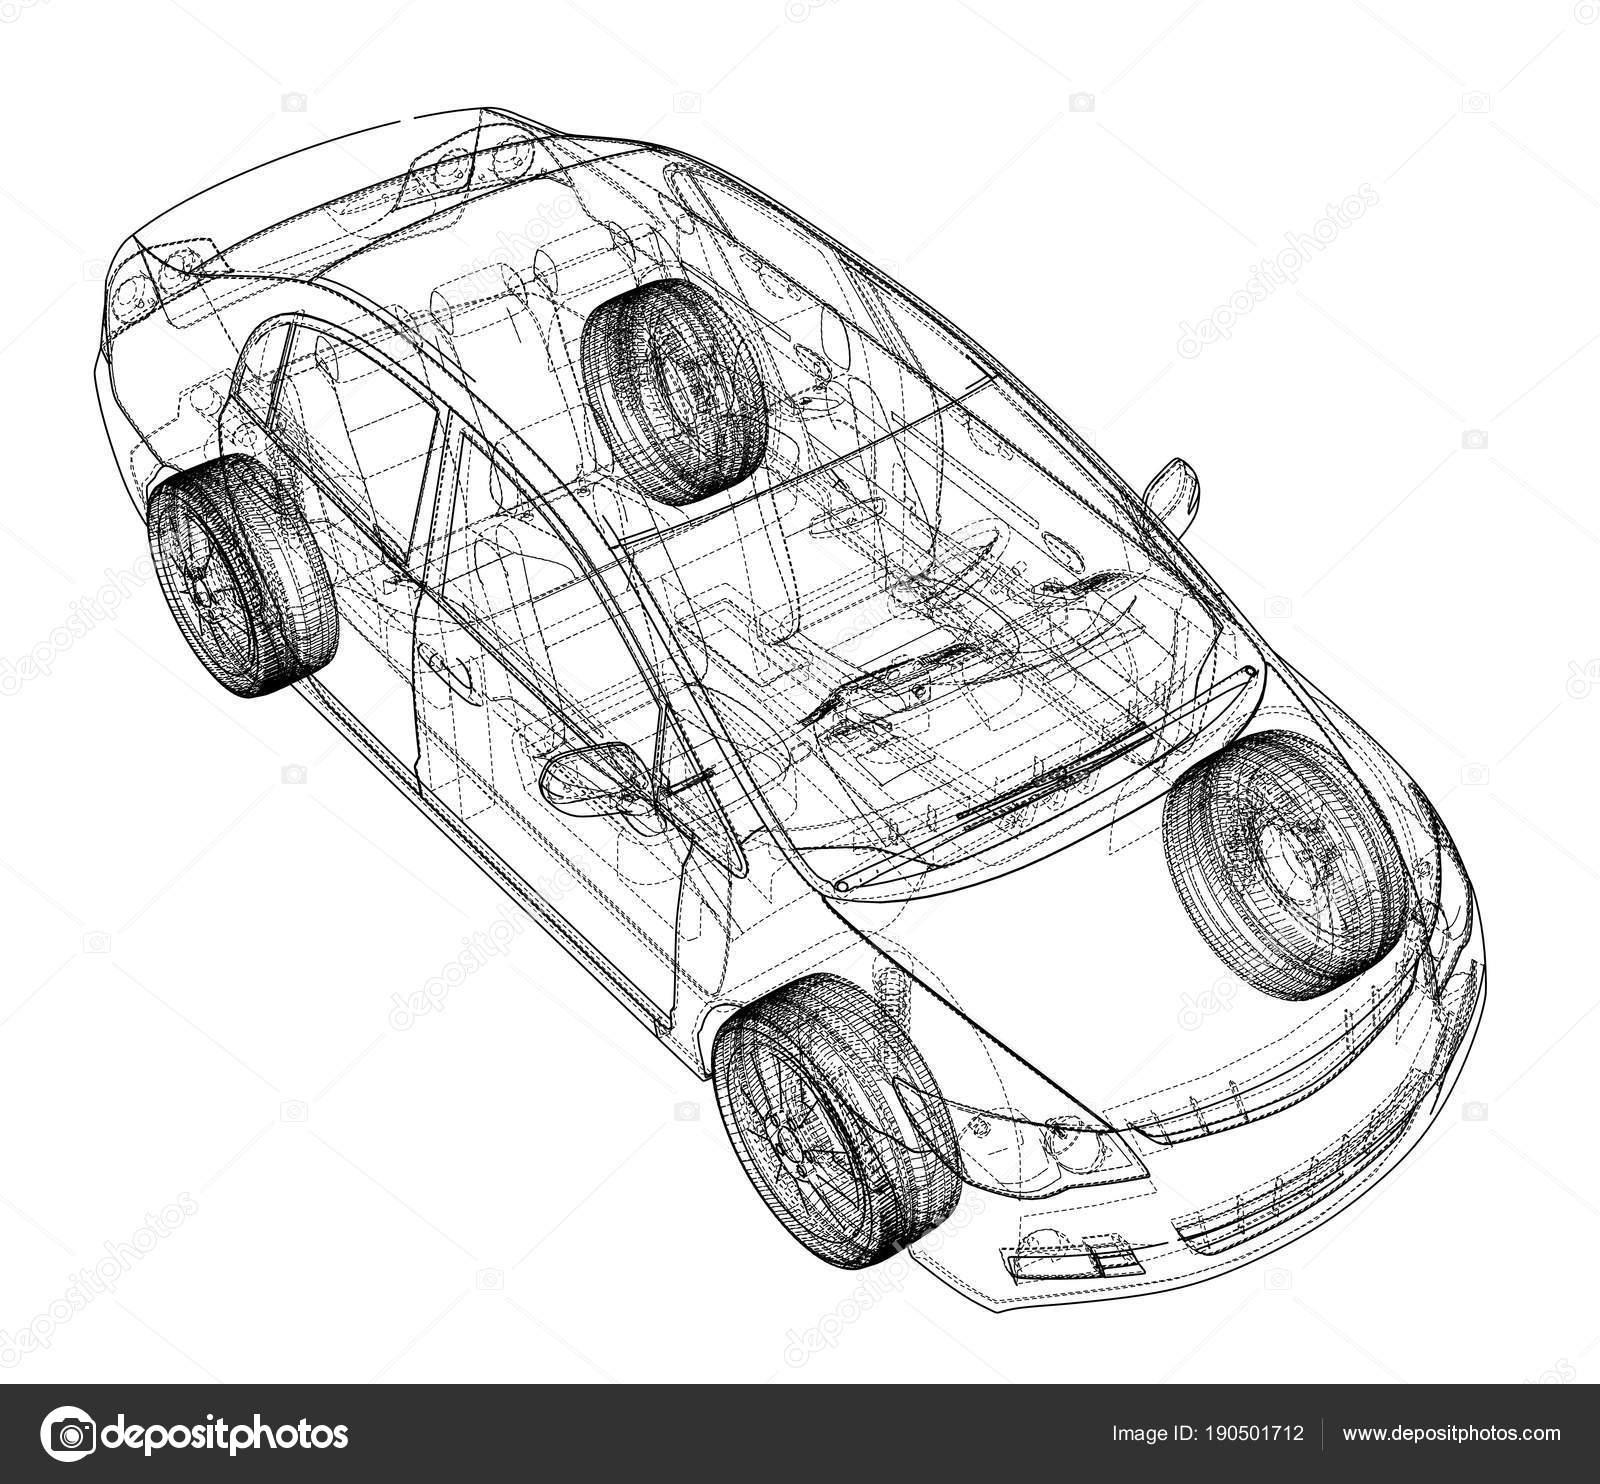 Concept car blueprint stock photo cherezoff 190501712 concept car blueprint stock photo malvernweather Images